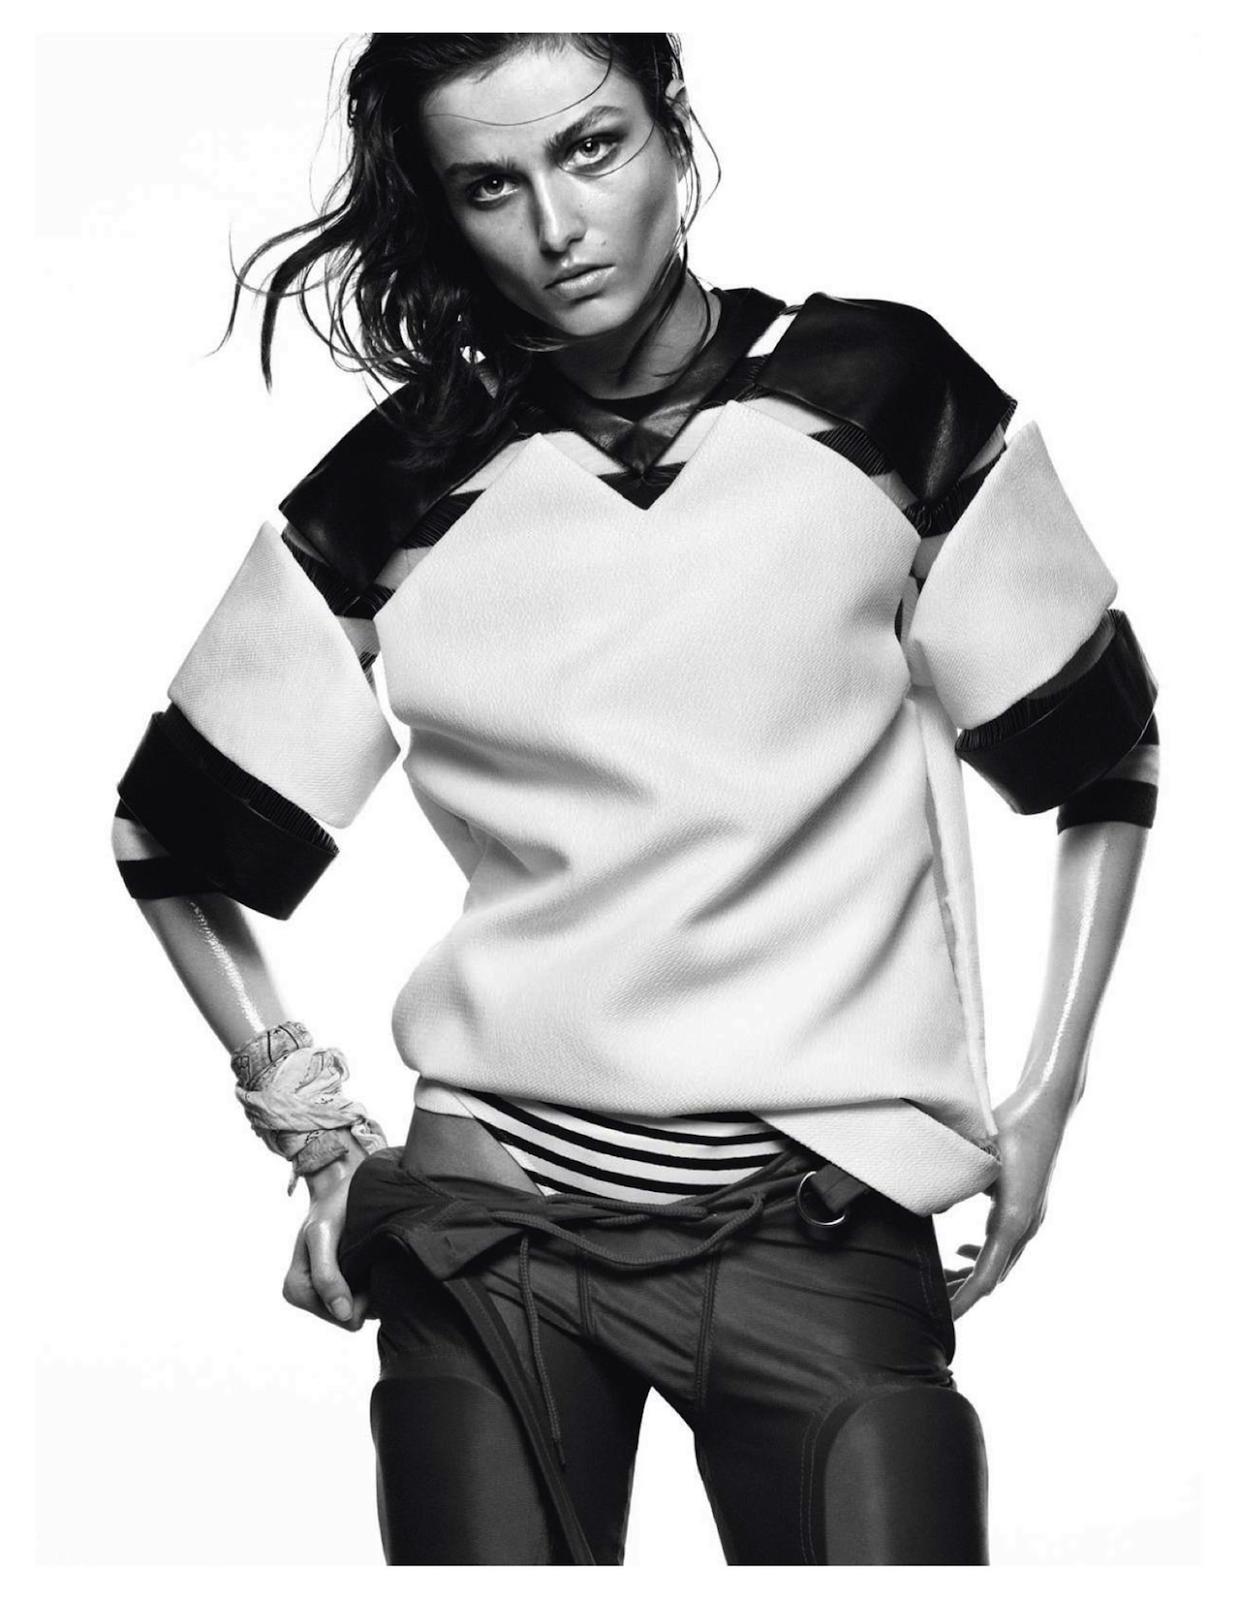 visual optimism; fashion editorials, shows, campaigns more!: dune: andreea diaconu by david sims for vogue paris may 2013